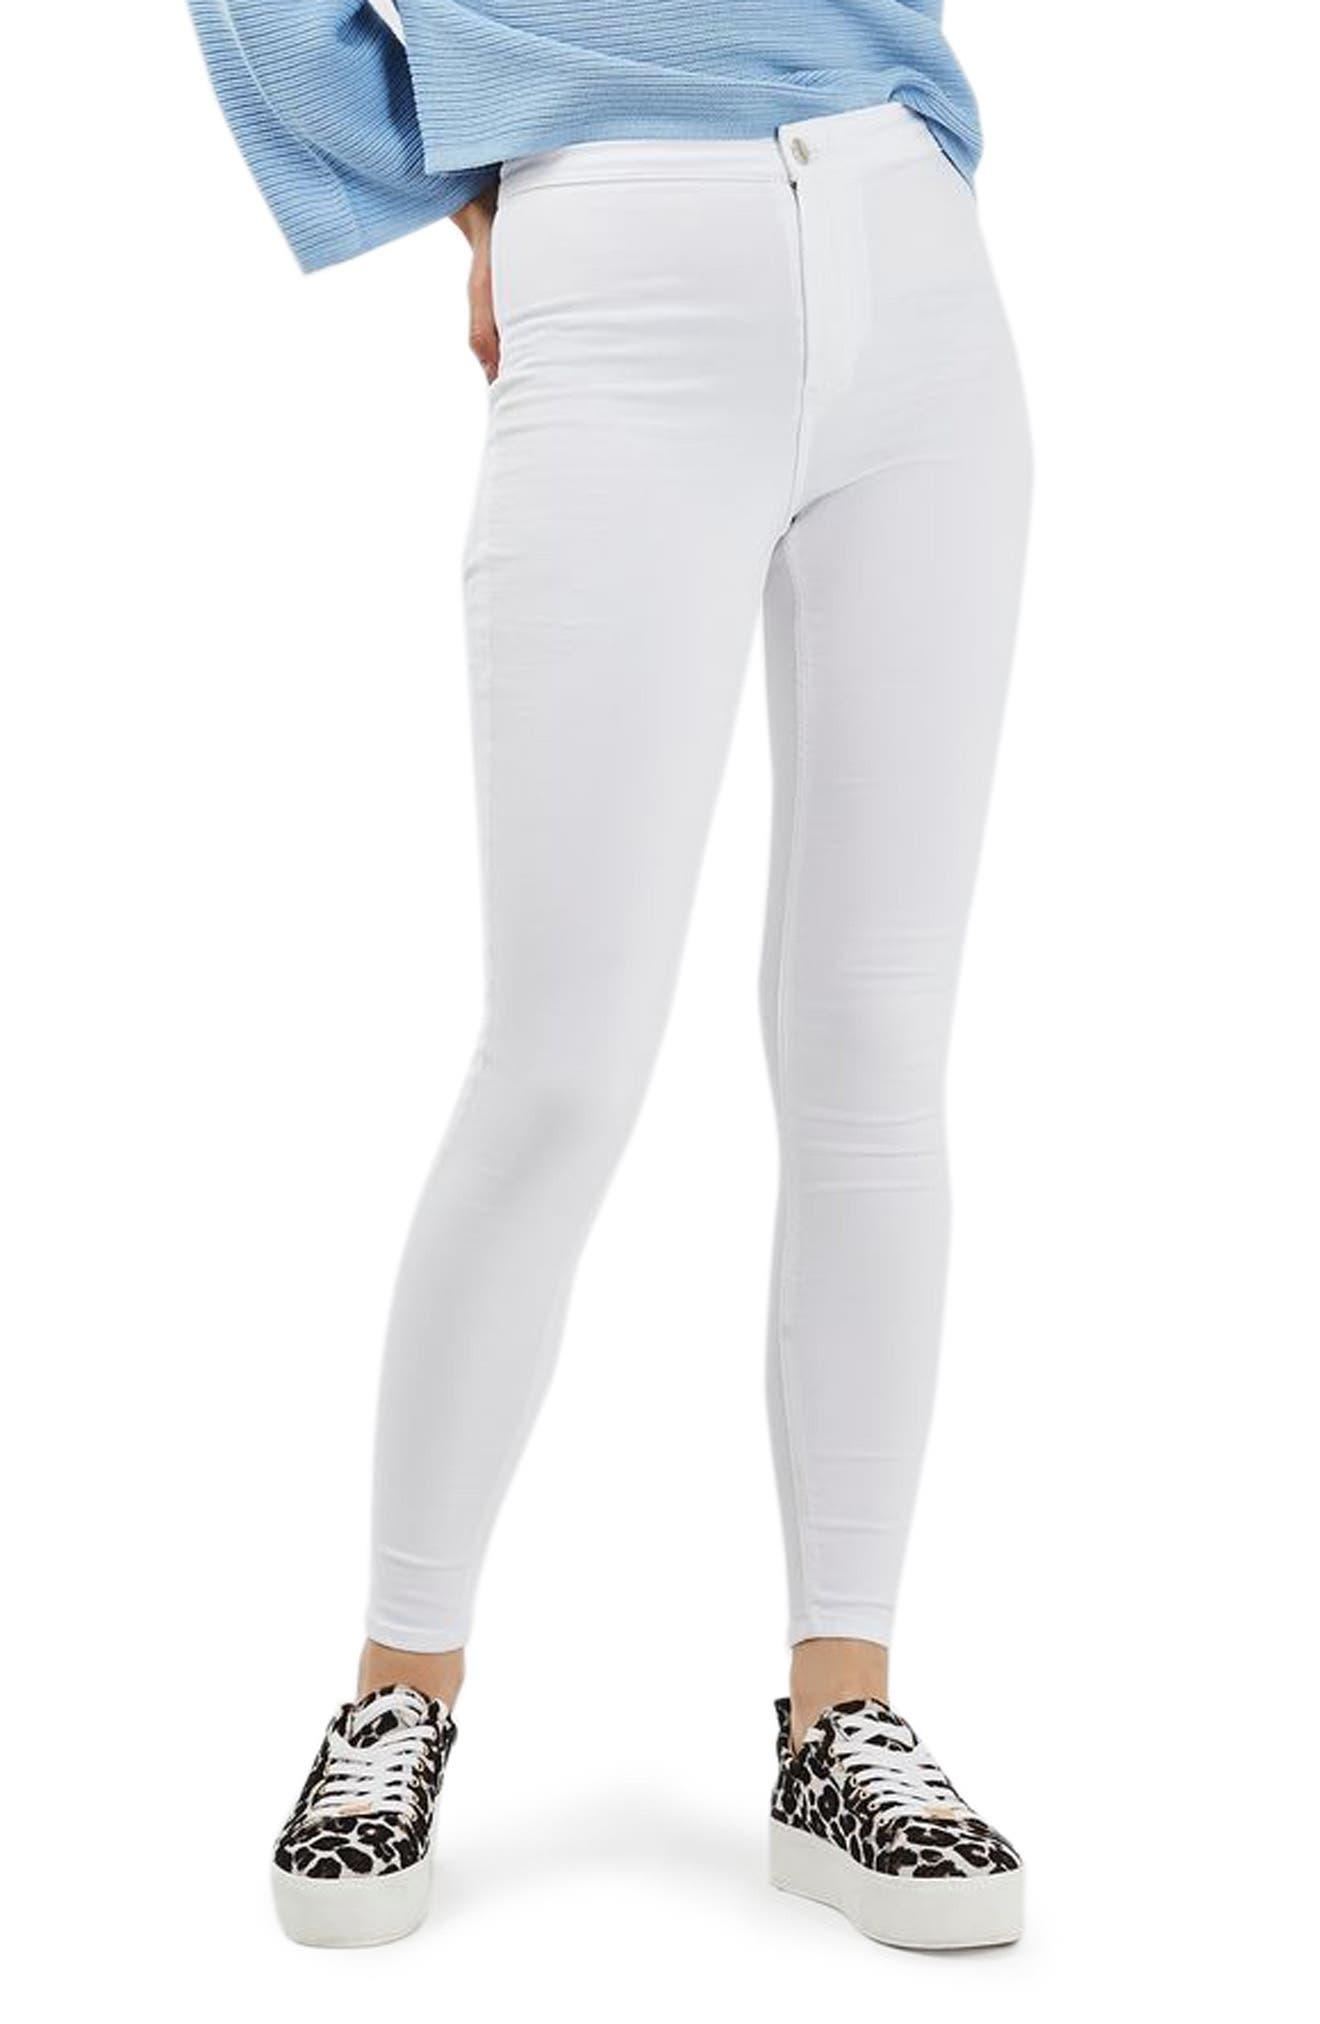 Joni Skinny Jeans,                         Main,                         color, 100